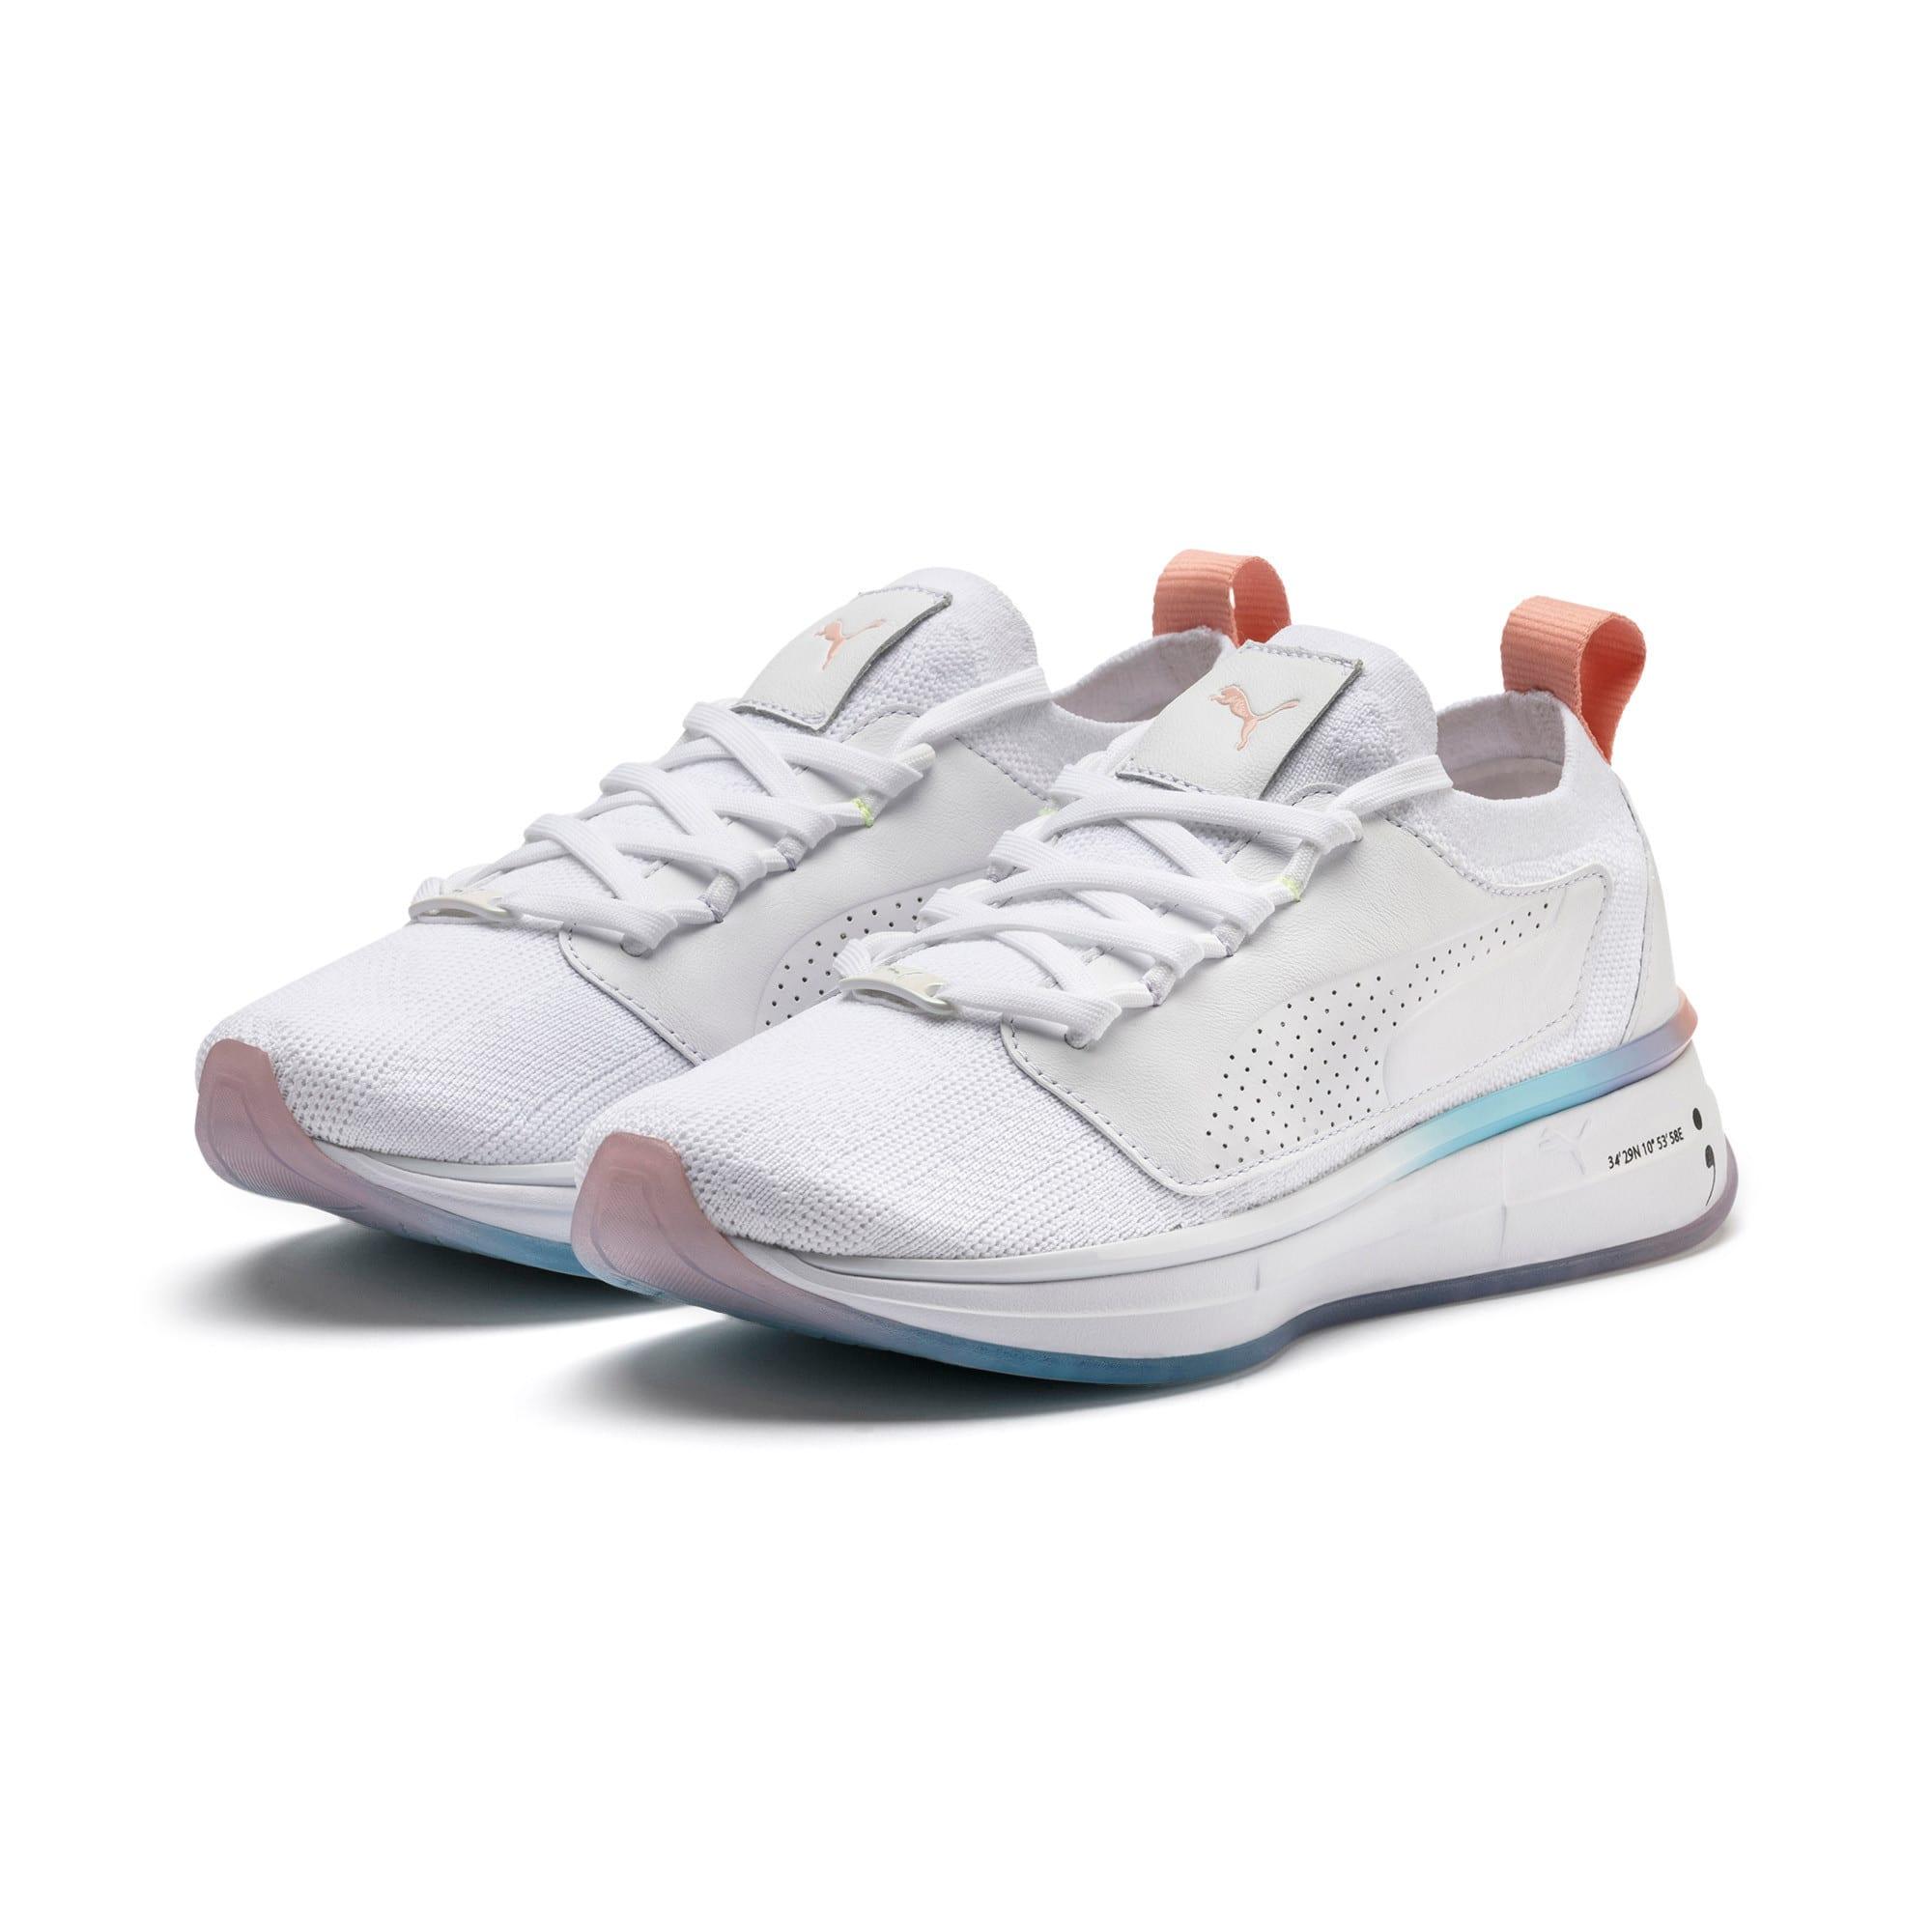 Thumbnail 3 of PUMA x SELENA GOMEZ Runner Women's Training Shoes, Puma White-Peach Bud, medium